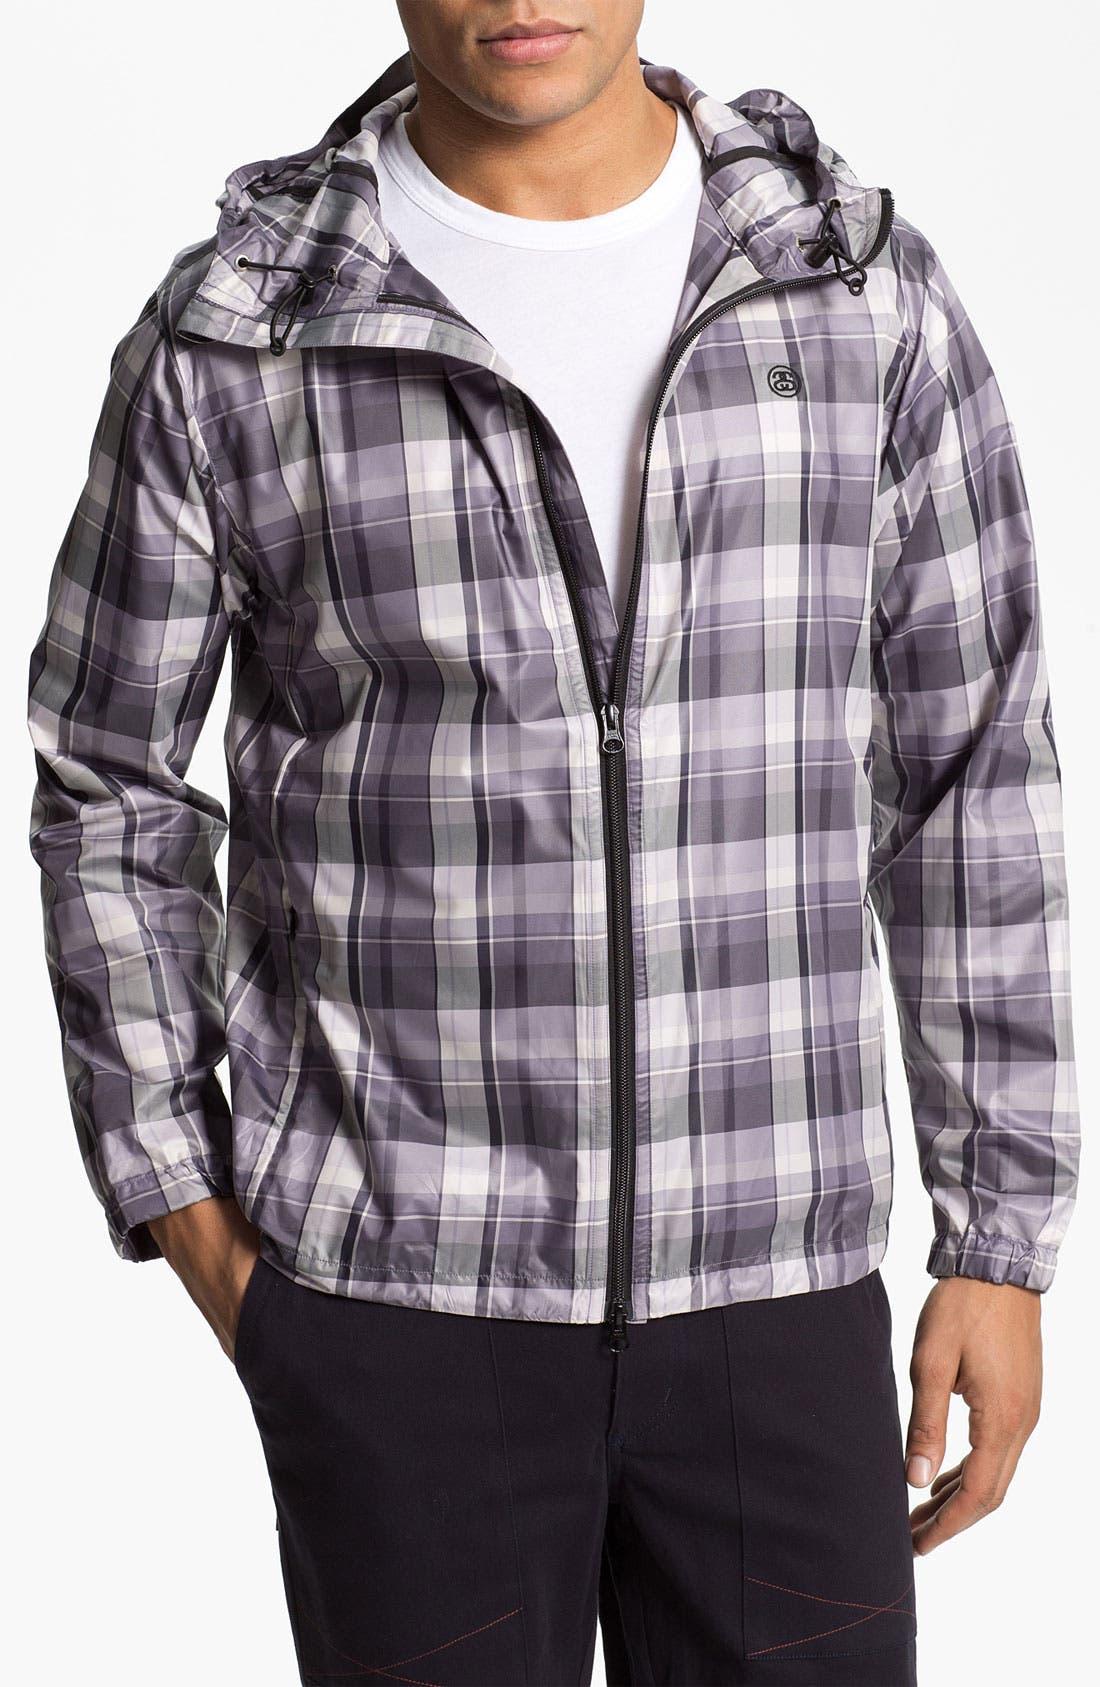 Alternate Image 1 Selected - Stussy Deluxe Plaid Print Hooded Jacket